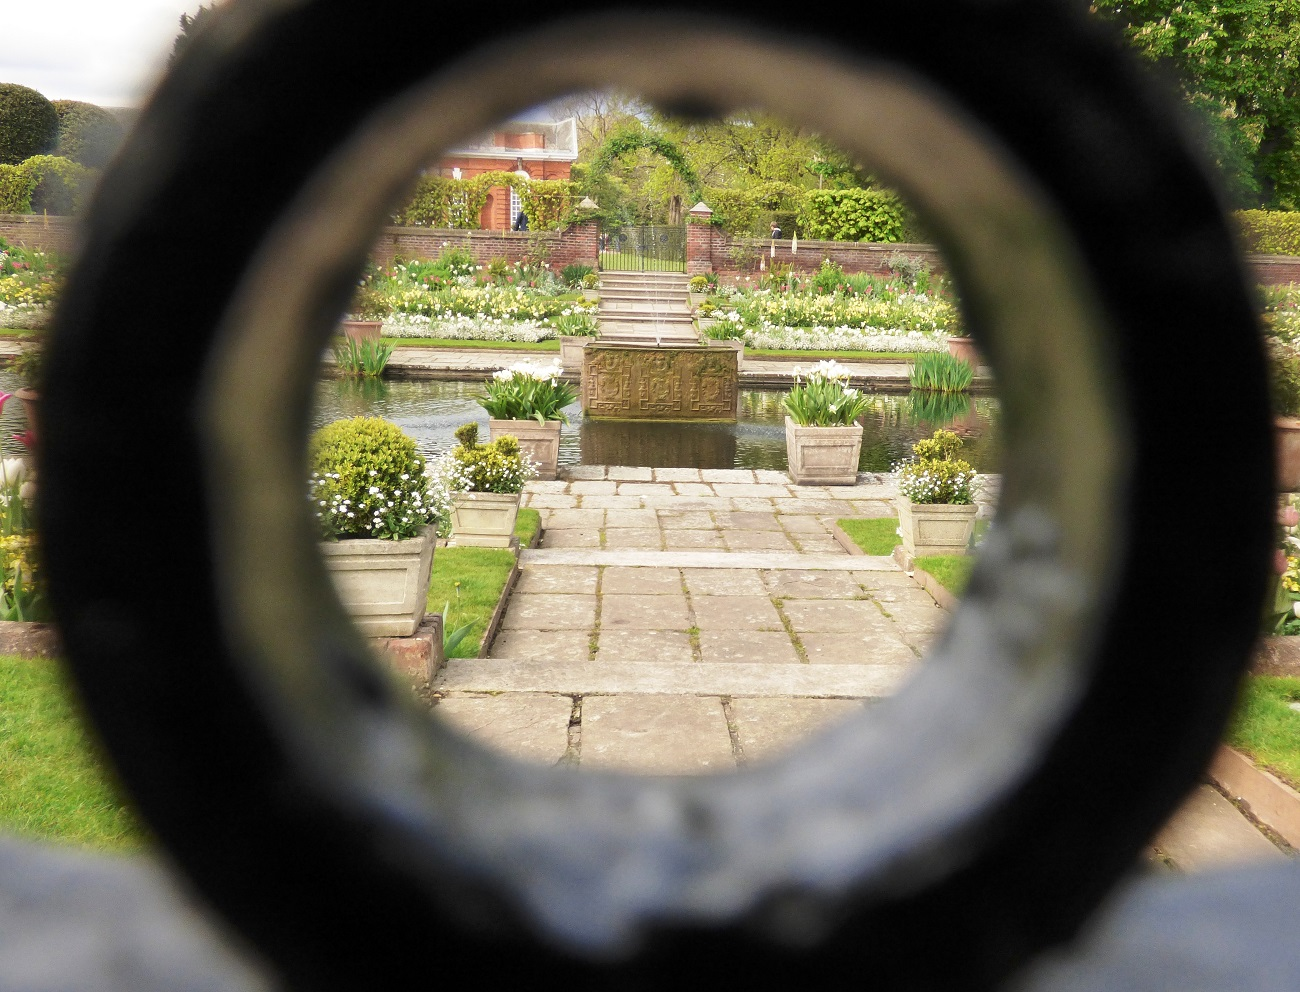 20170407_Westminster_Kensington-Palace-Memorial-Garden_Kensington-Palace-Memorial-Garden